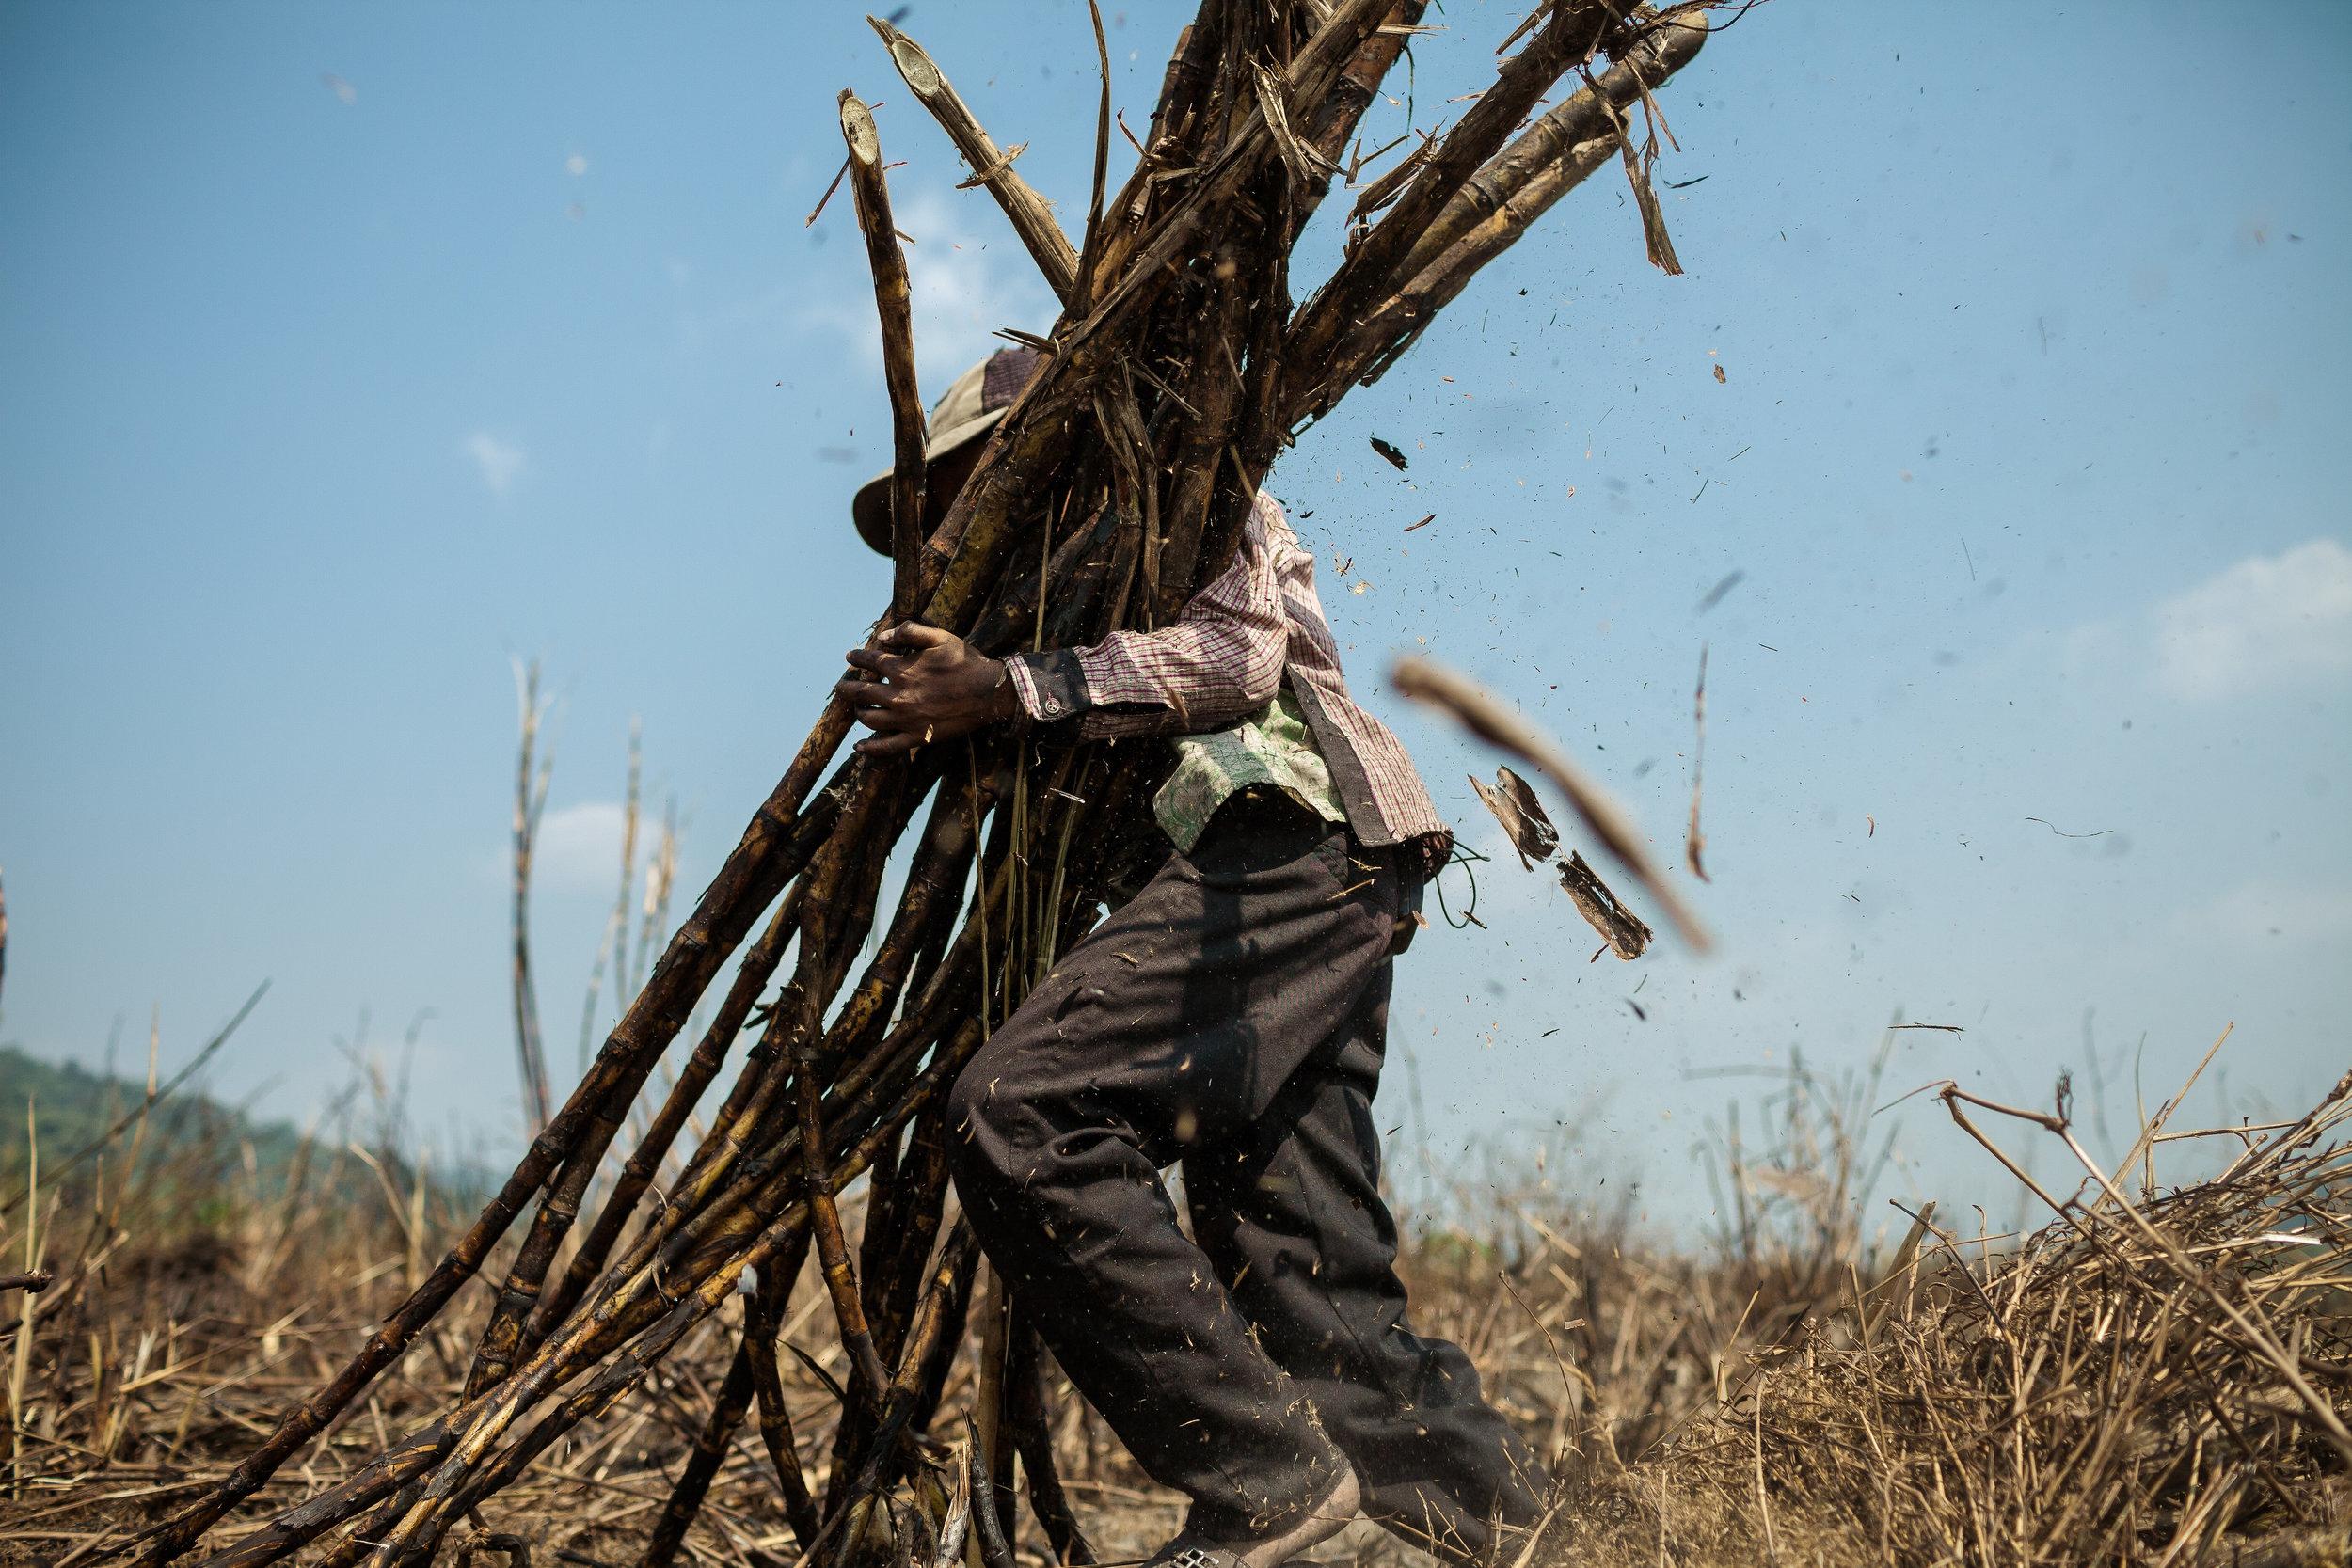 Image: Sugar plantation of Srei Ambel, Koh Kong - Cambodia. 16 Jan. 2013 © Thomas Cristofoletti / Ruom